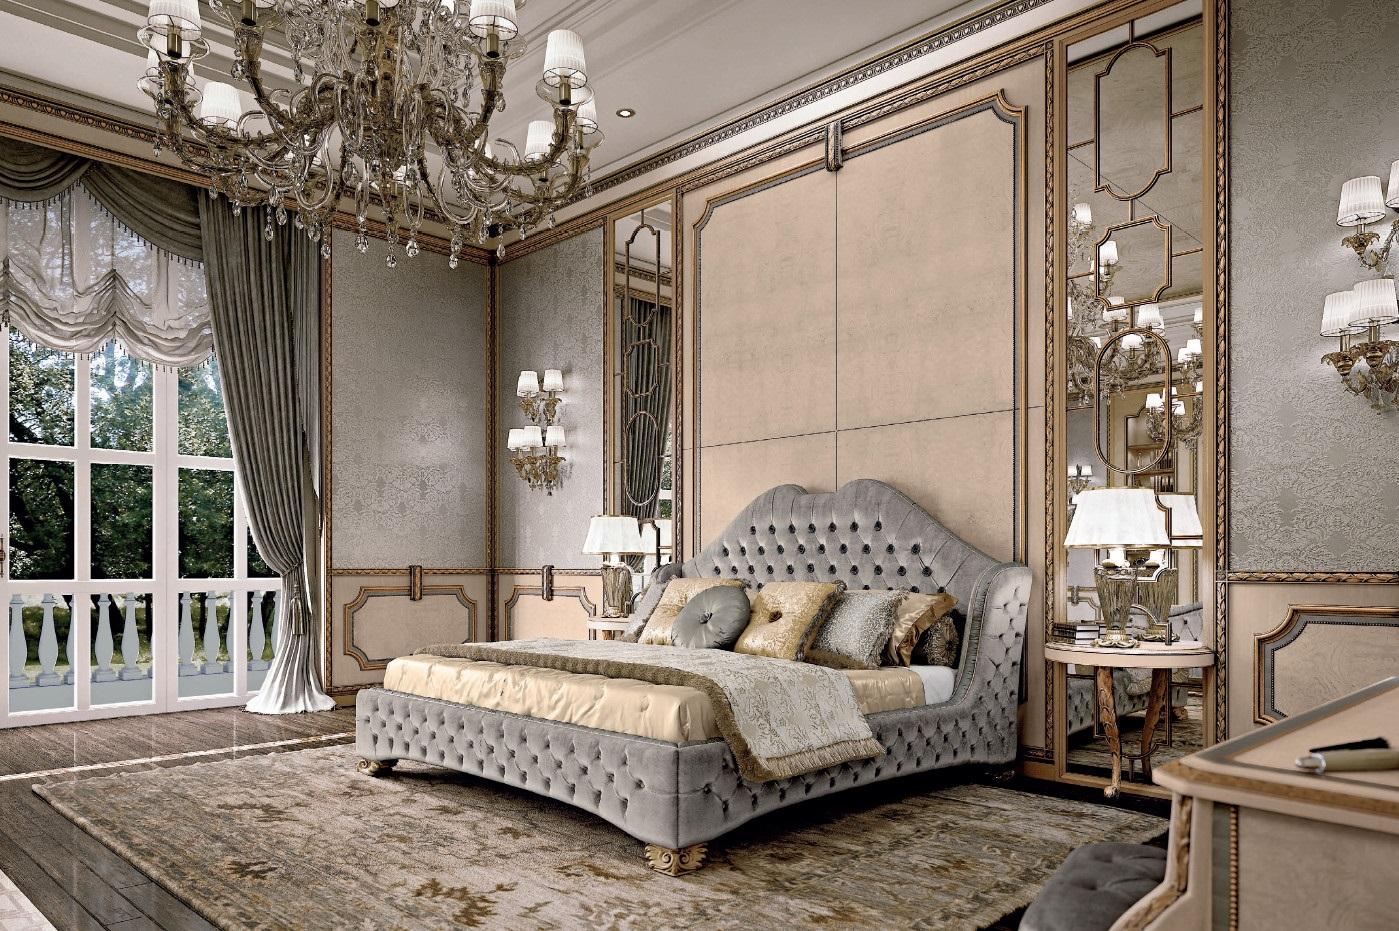 итальянские спальни 45 фото спальни из италии модели Palazzo